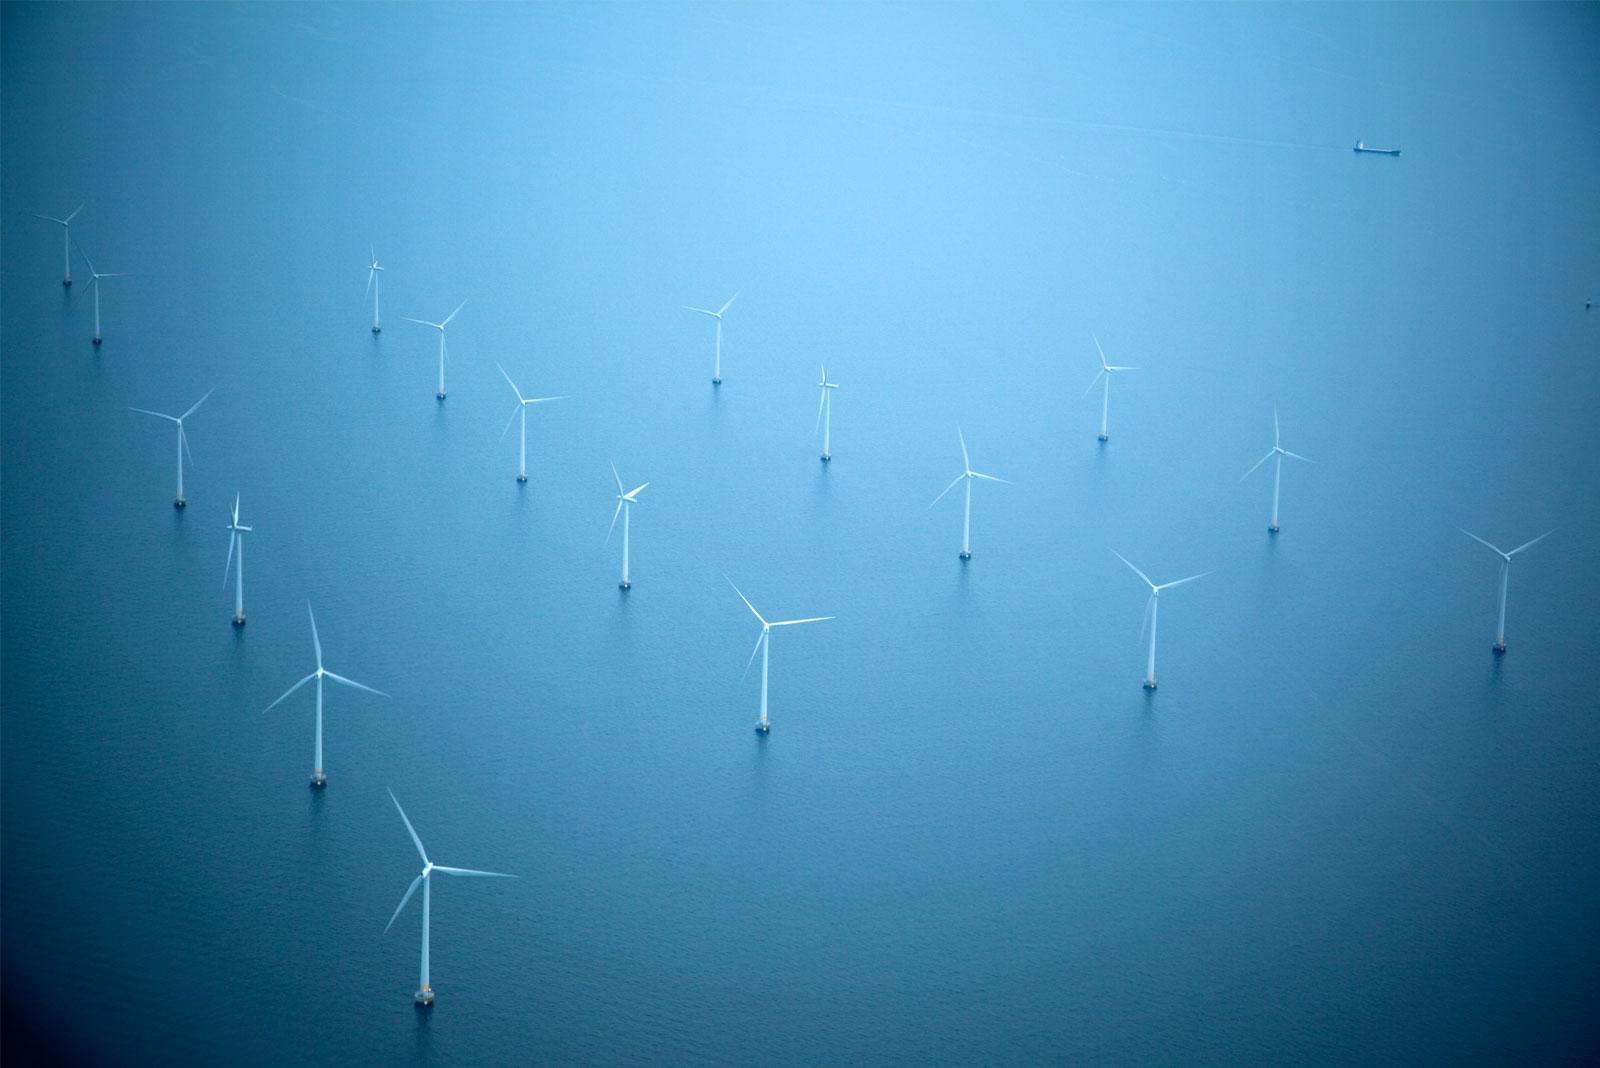 Elektriciteitsrendement fors omhoog